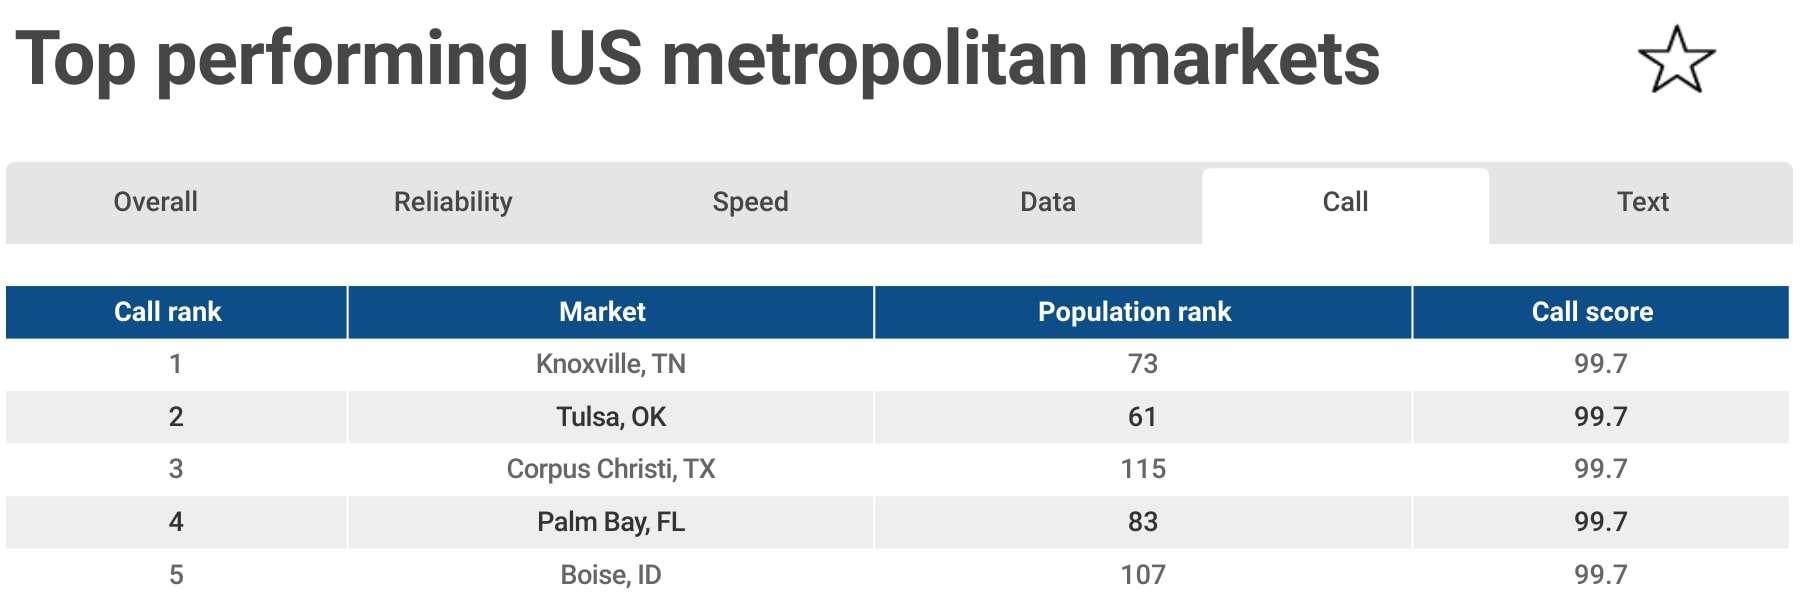 RootMetrics Top performing US Cities 1H 2018 05